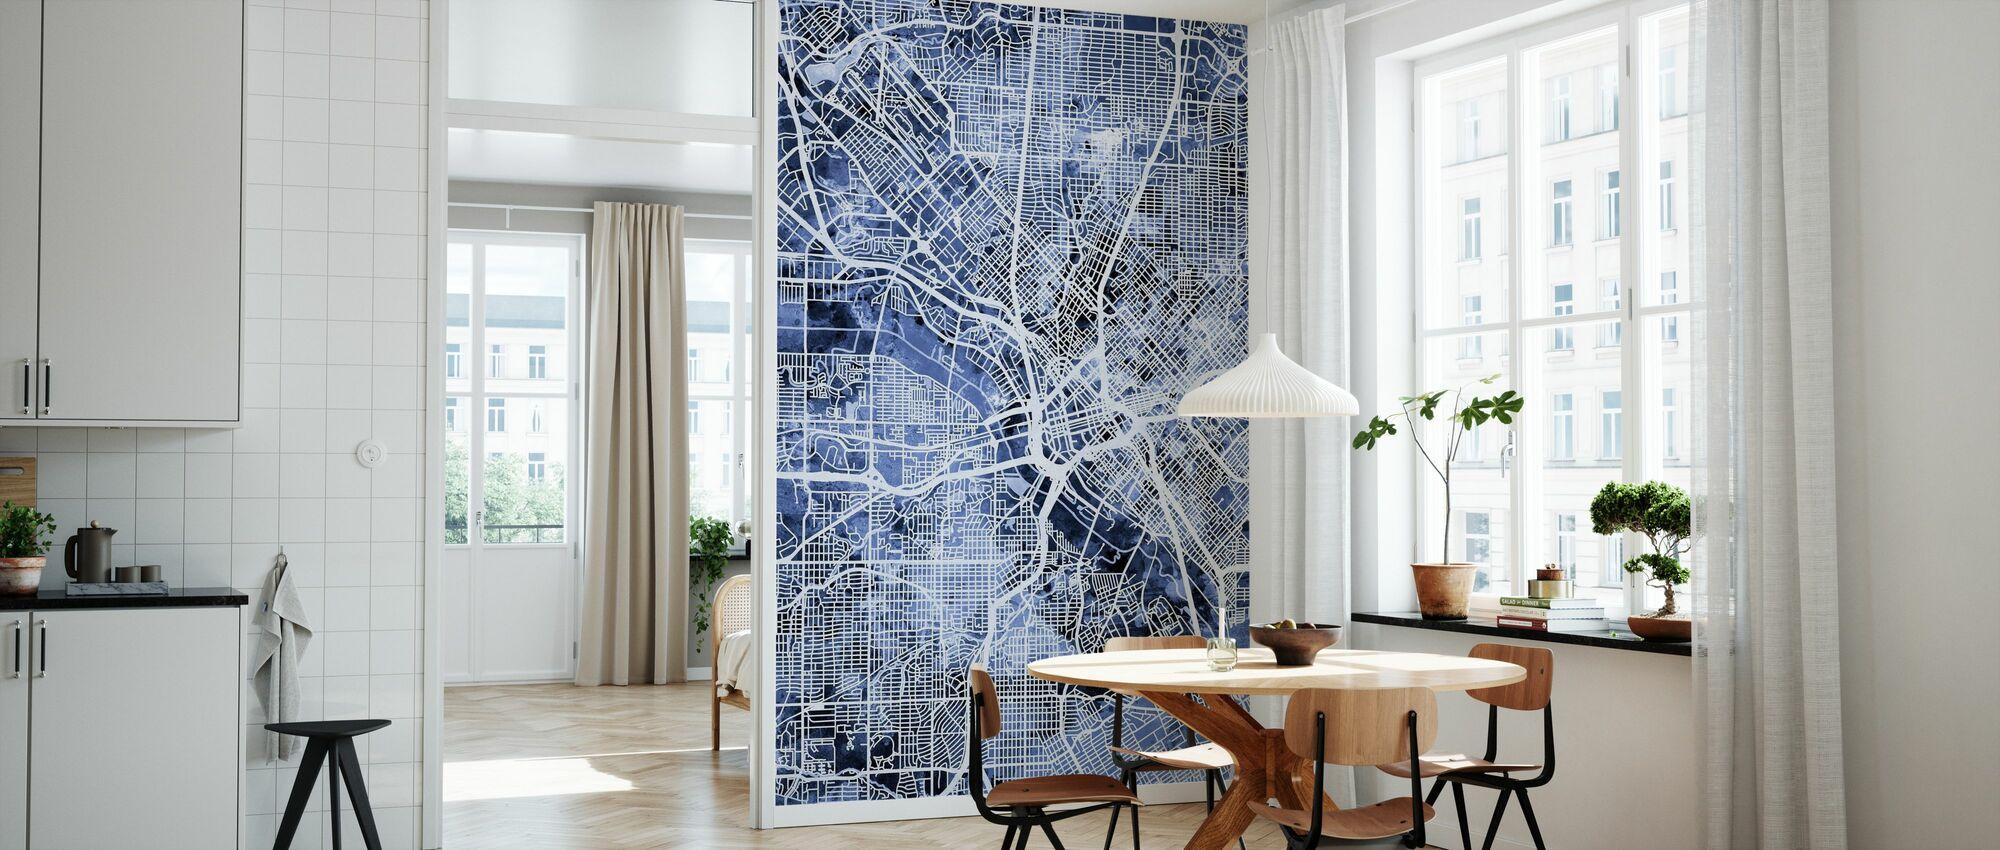 Dallas Texas City Map - Wallpaper - Kitchen